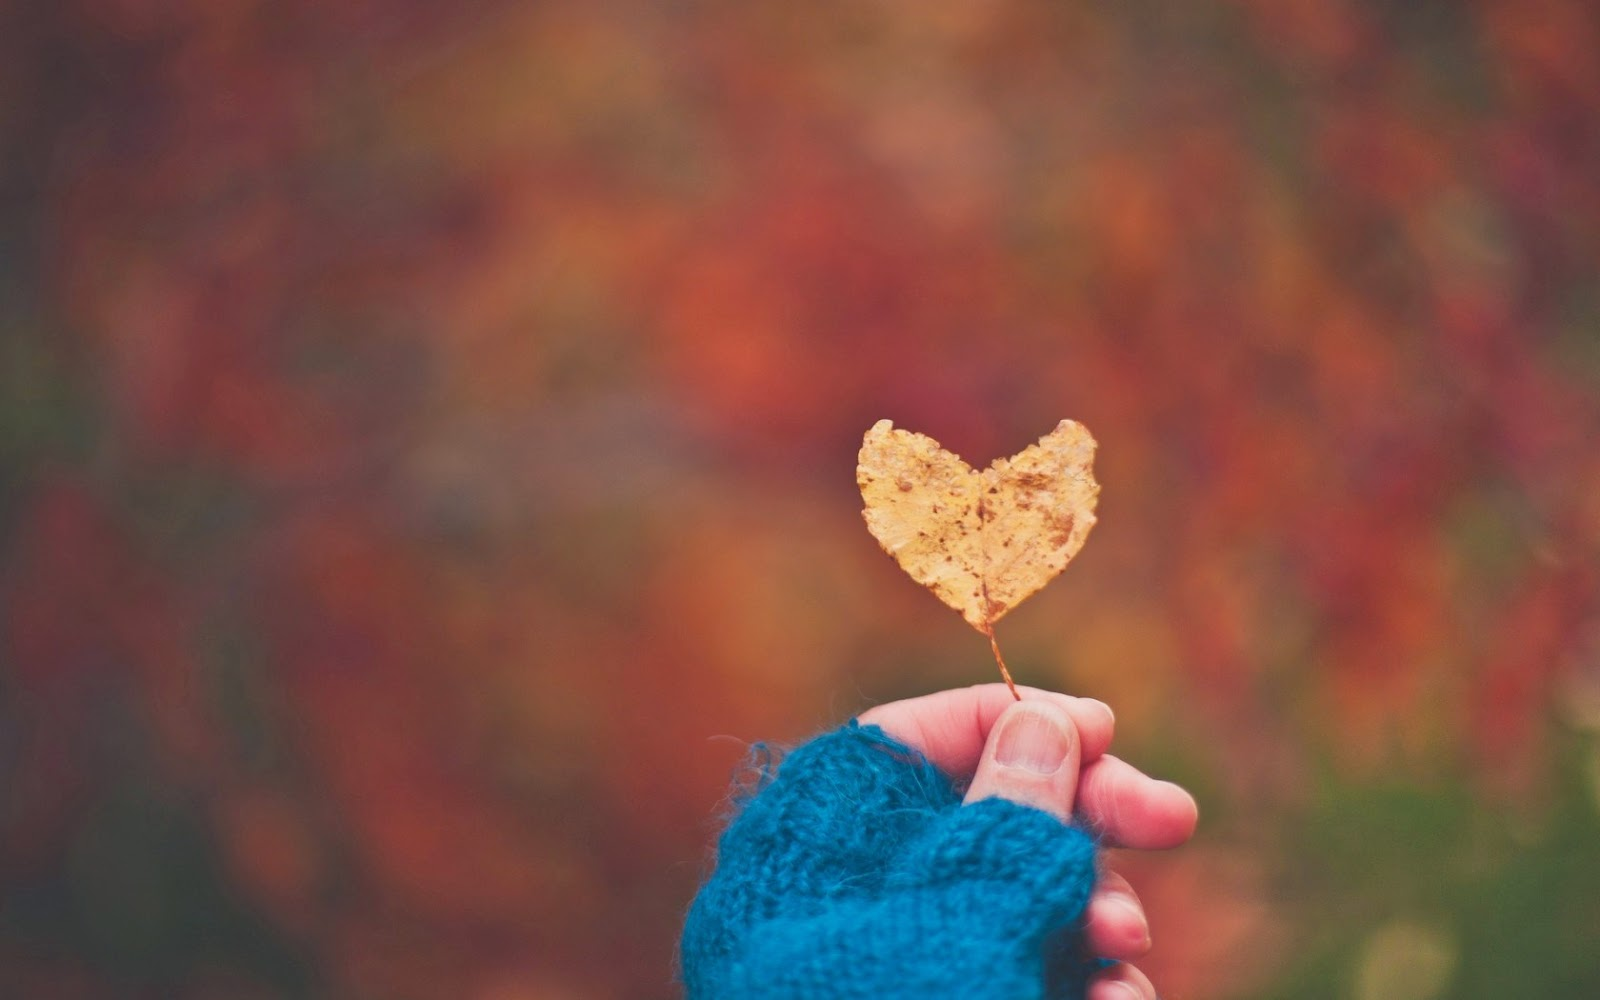 قلوب حب باليد